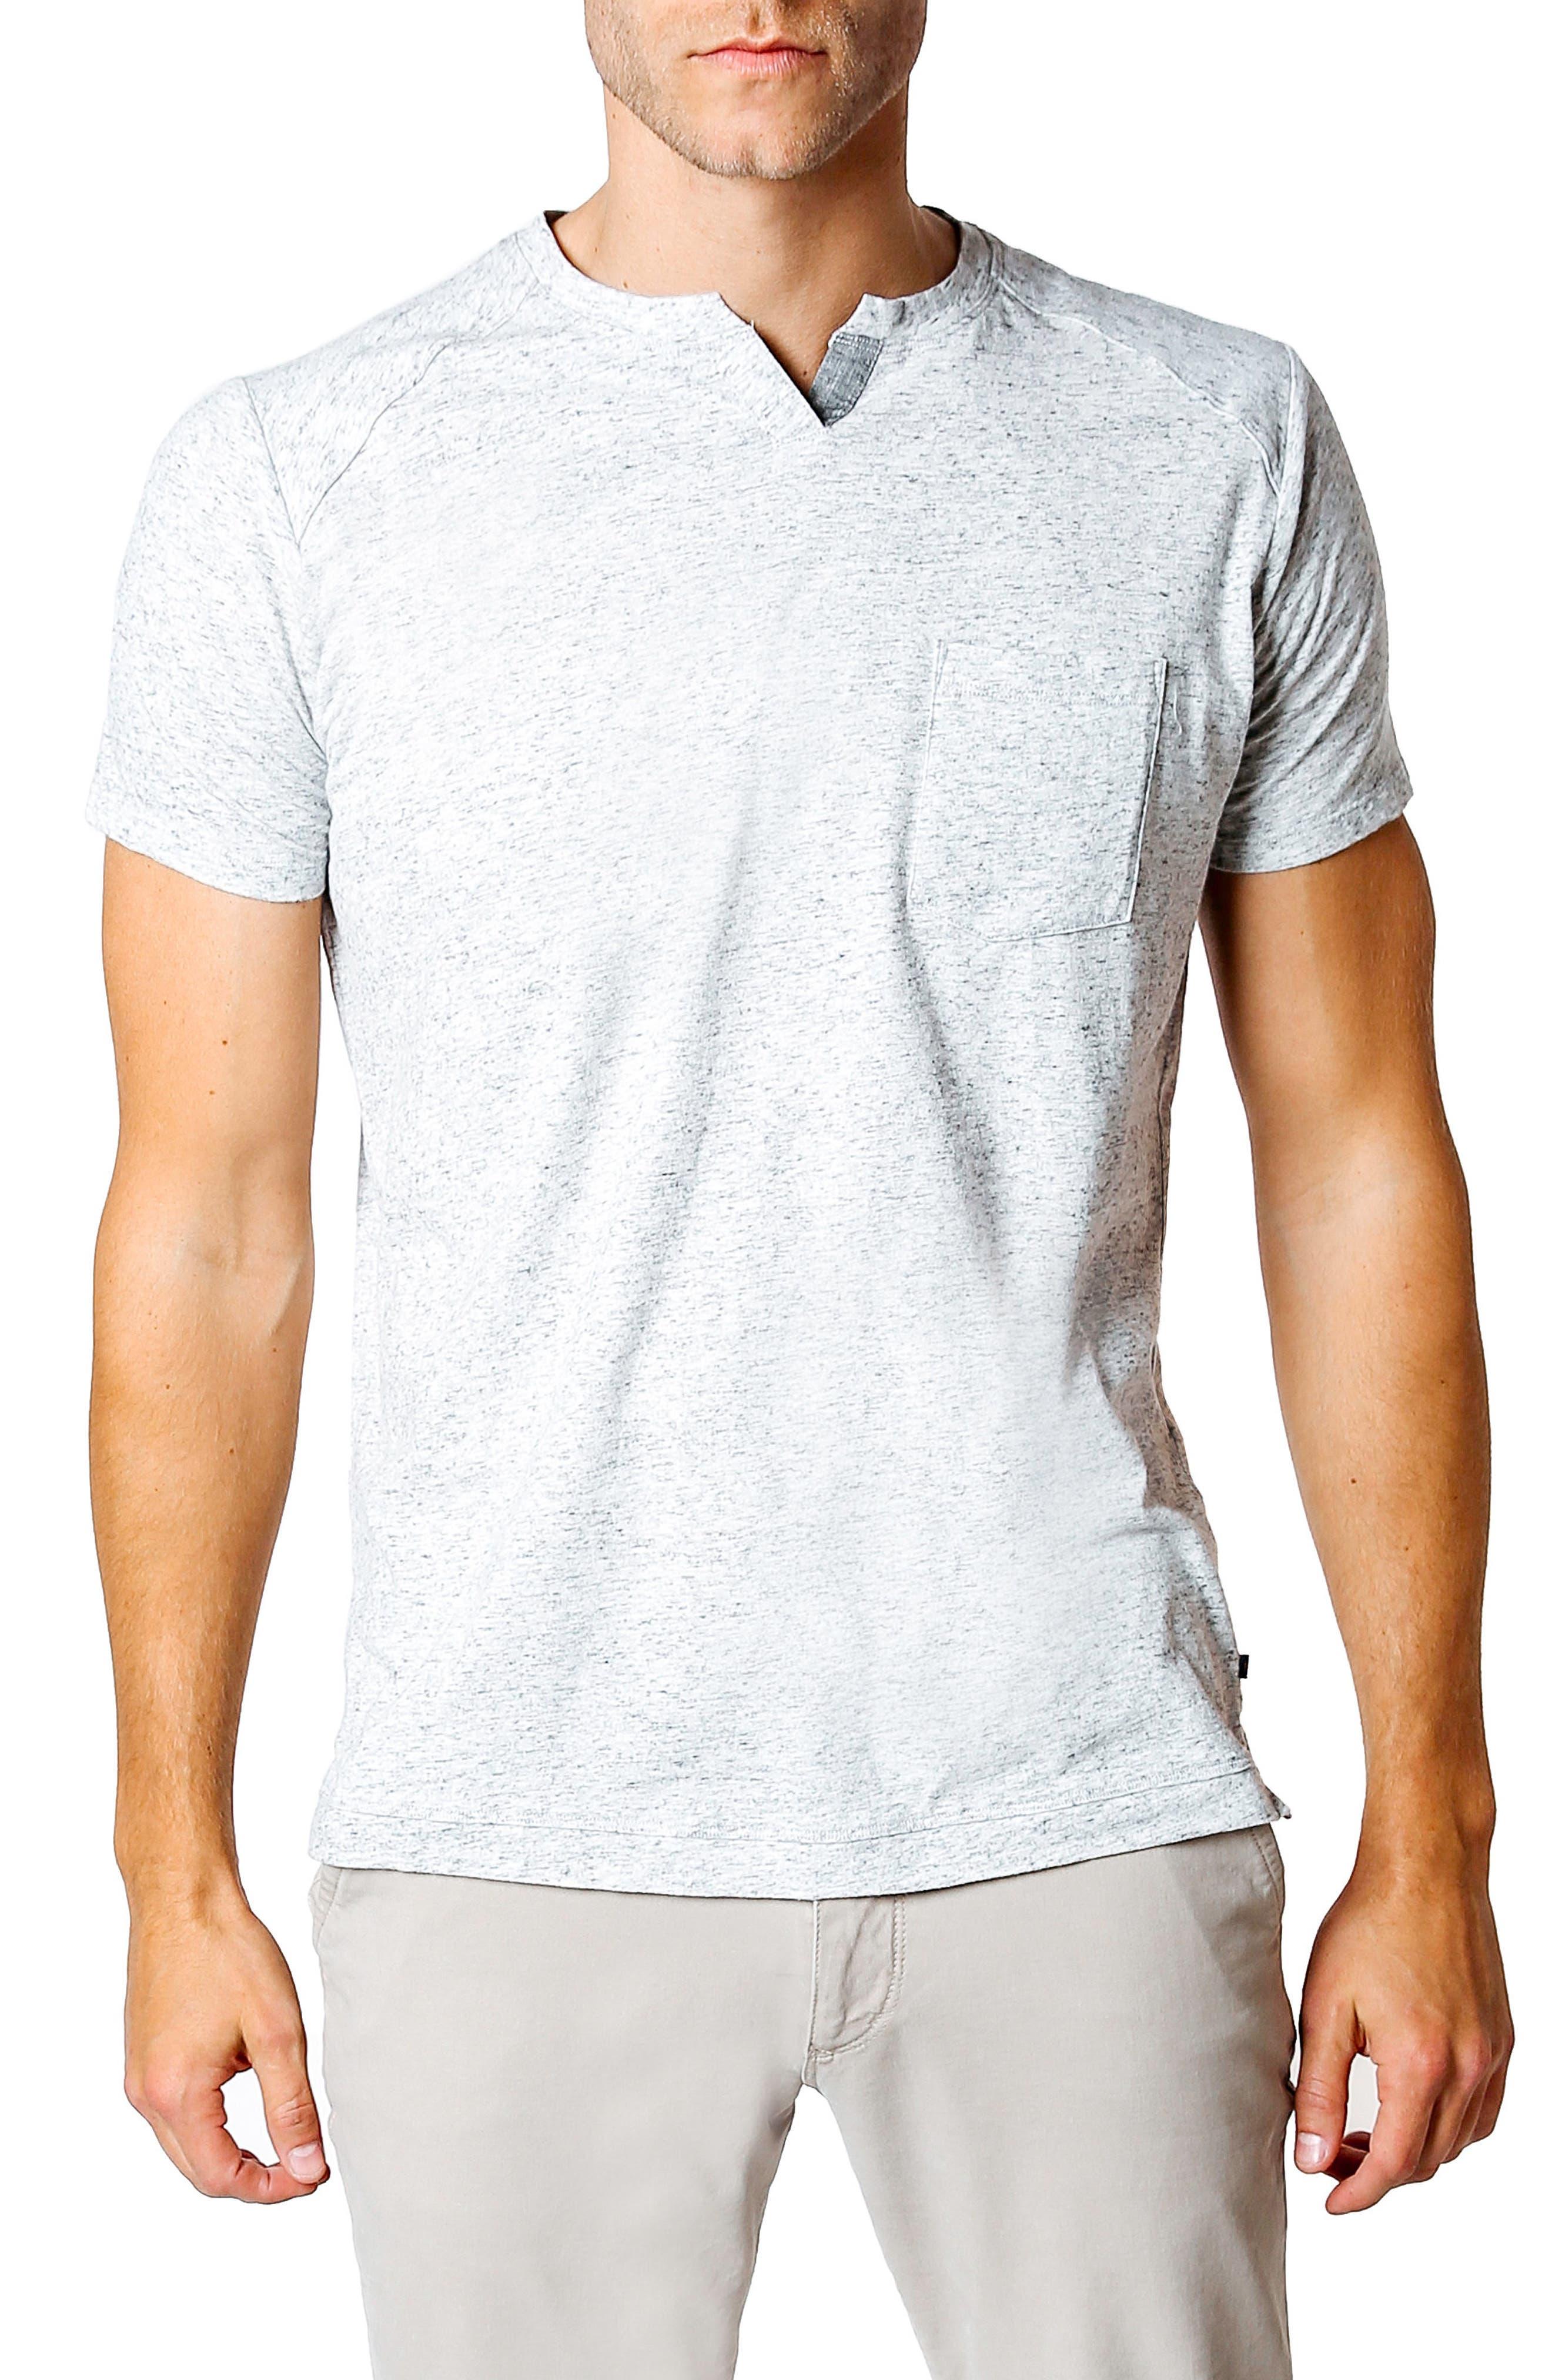 Good Man Brand Slim Fit T-Shirt